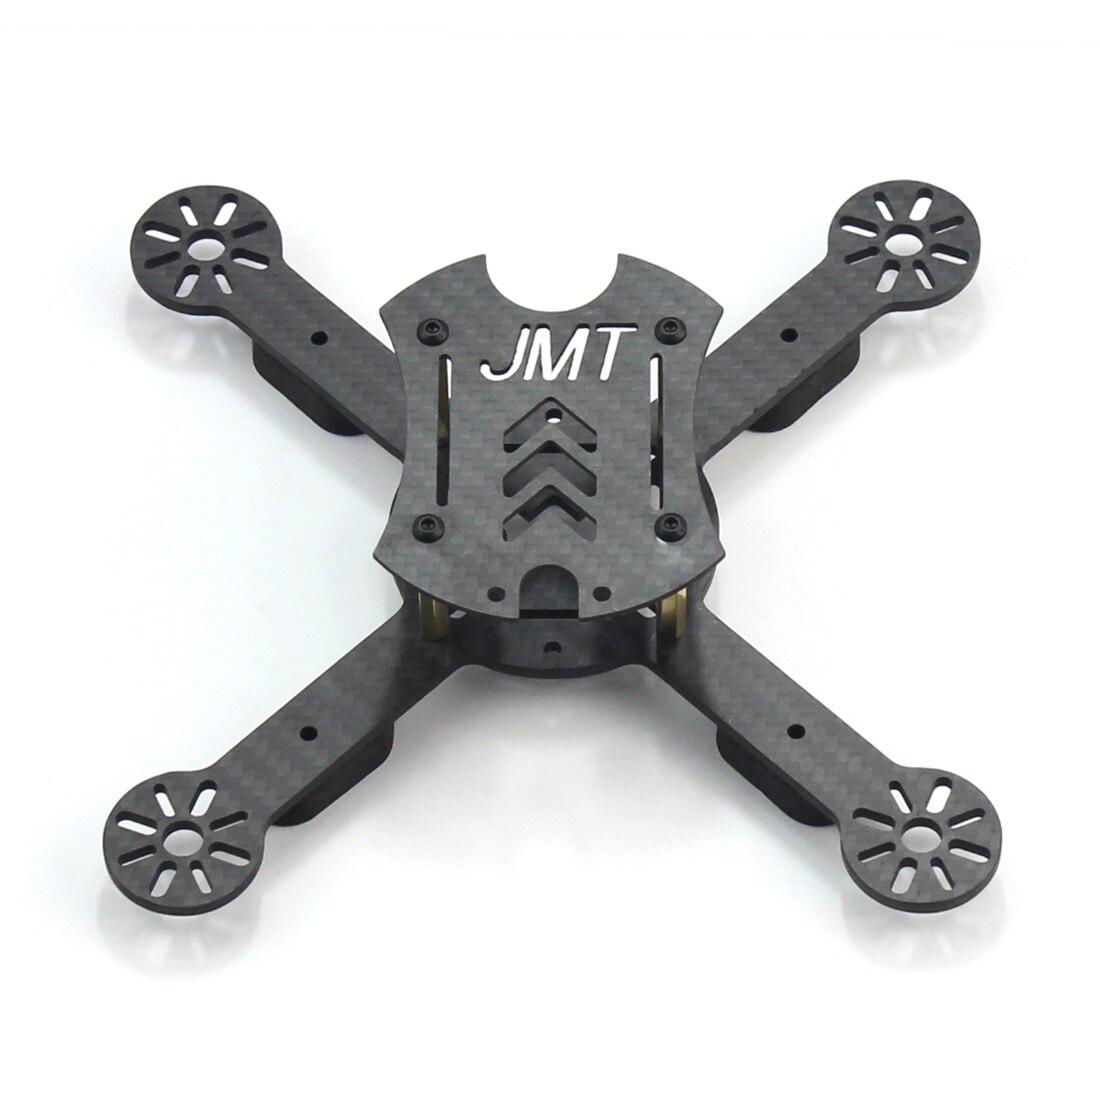 JMT X180 DIY Quadcopter PNP Assembled Racer Kit 180mm Super Light Mini RC Racing Drone with OSD FPV HD Camera NO RX TX Battery